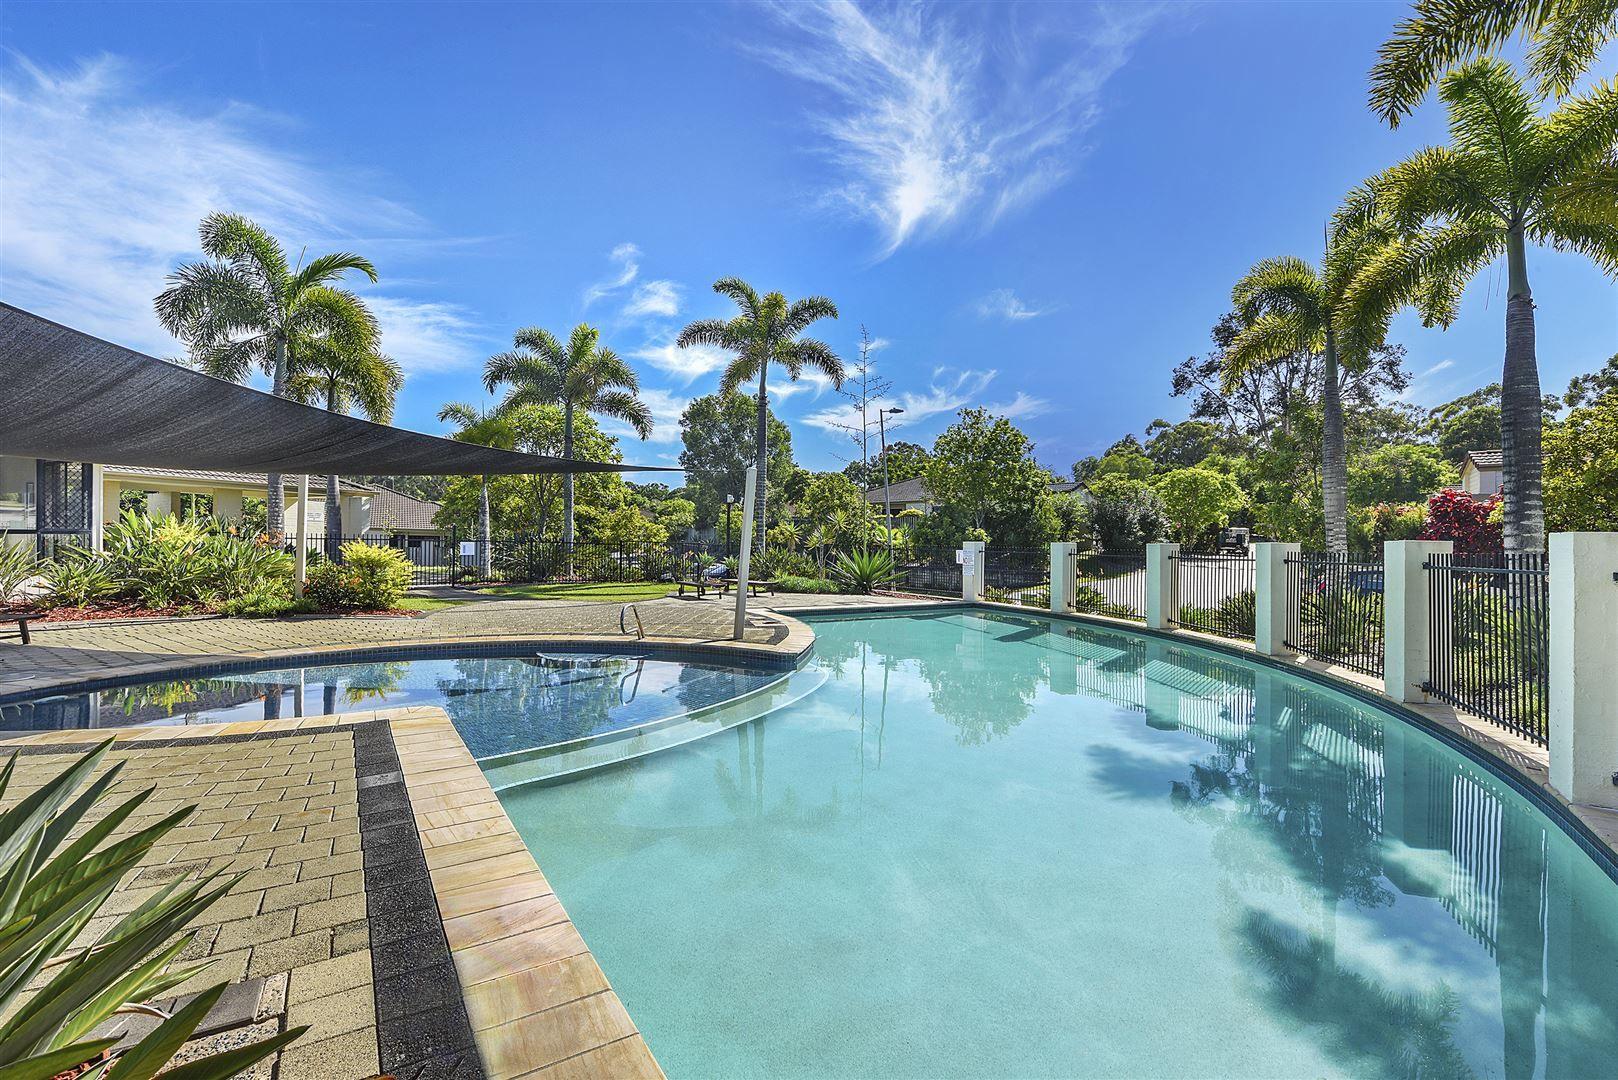 70/590 Pine Ridge Road, Coombabah QLD 4216, Image 0